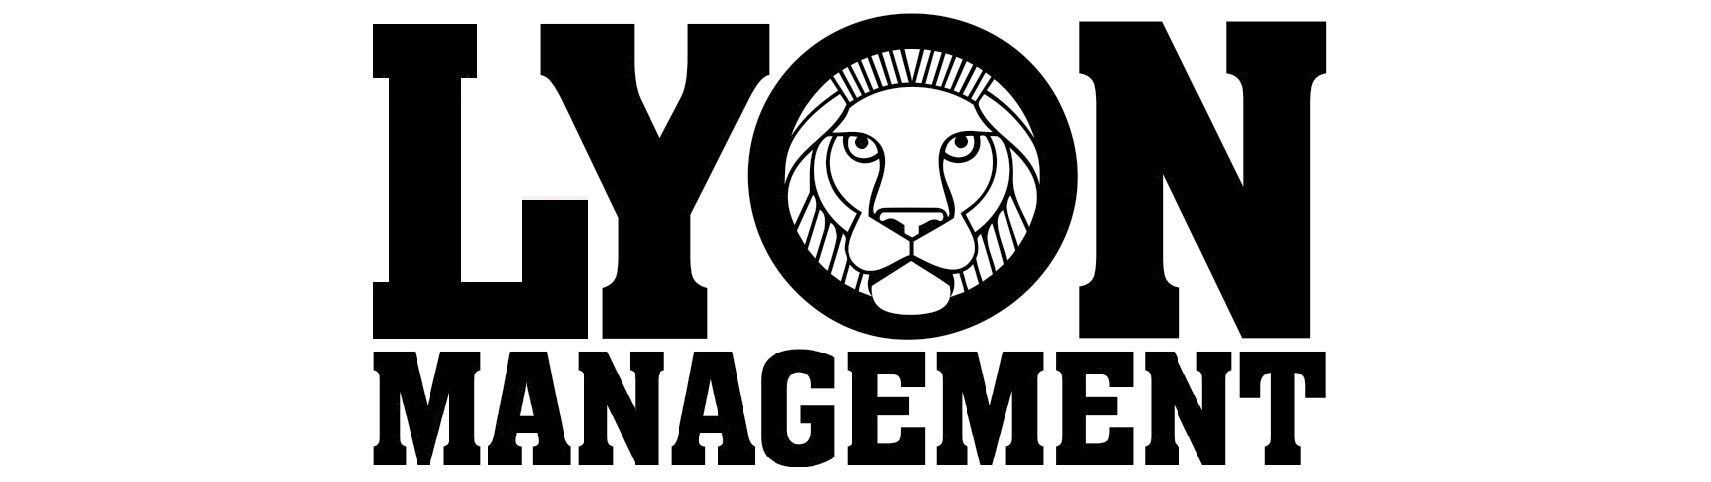 Lyon Management Company